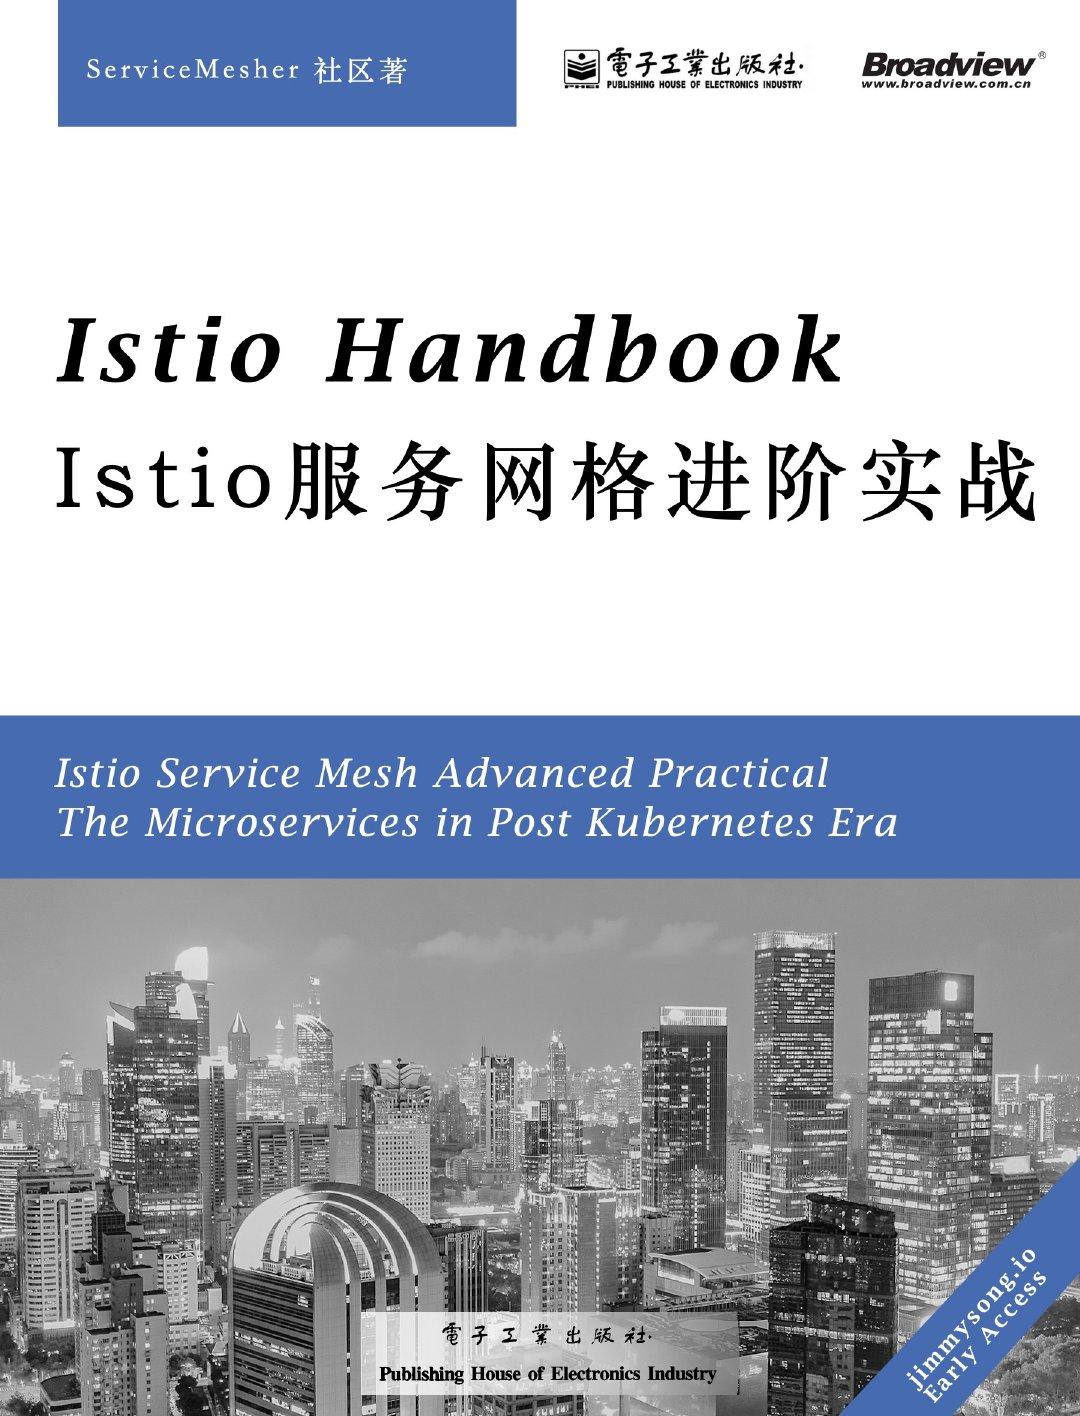 Istio handbook